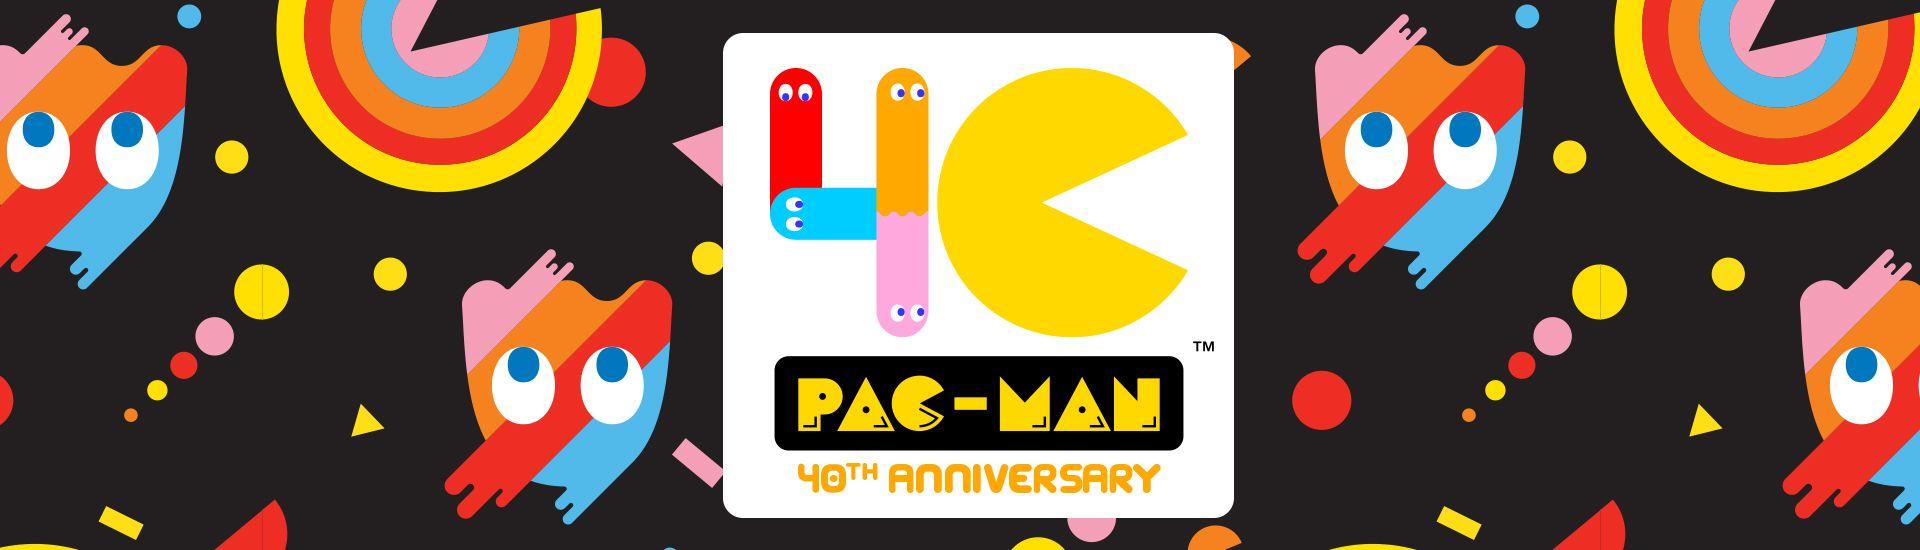 Pac-man compie 40 anni